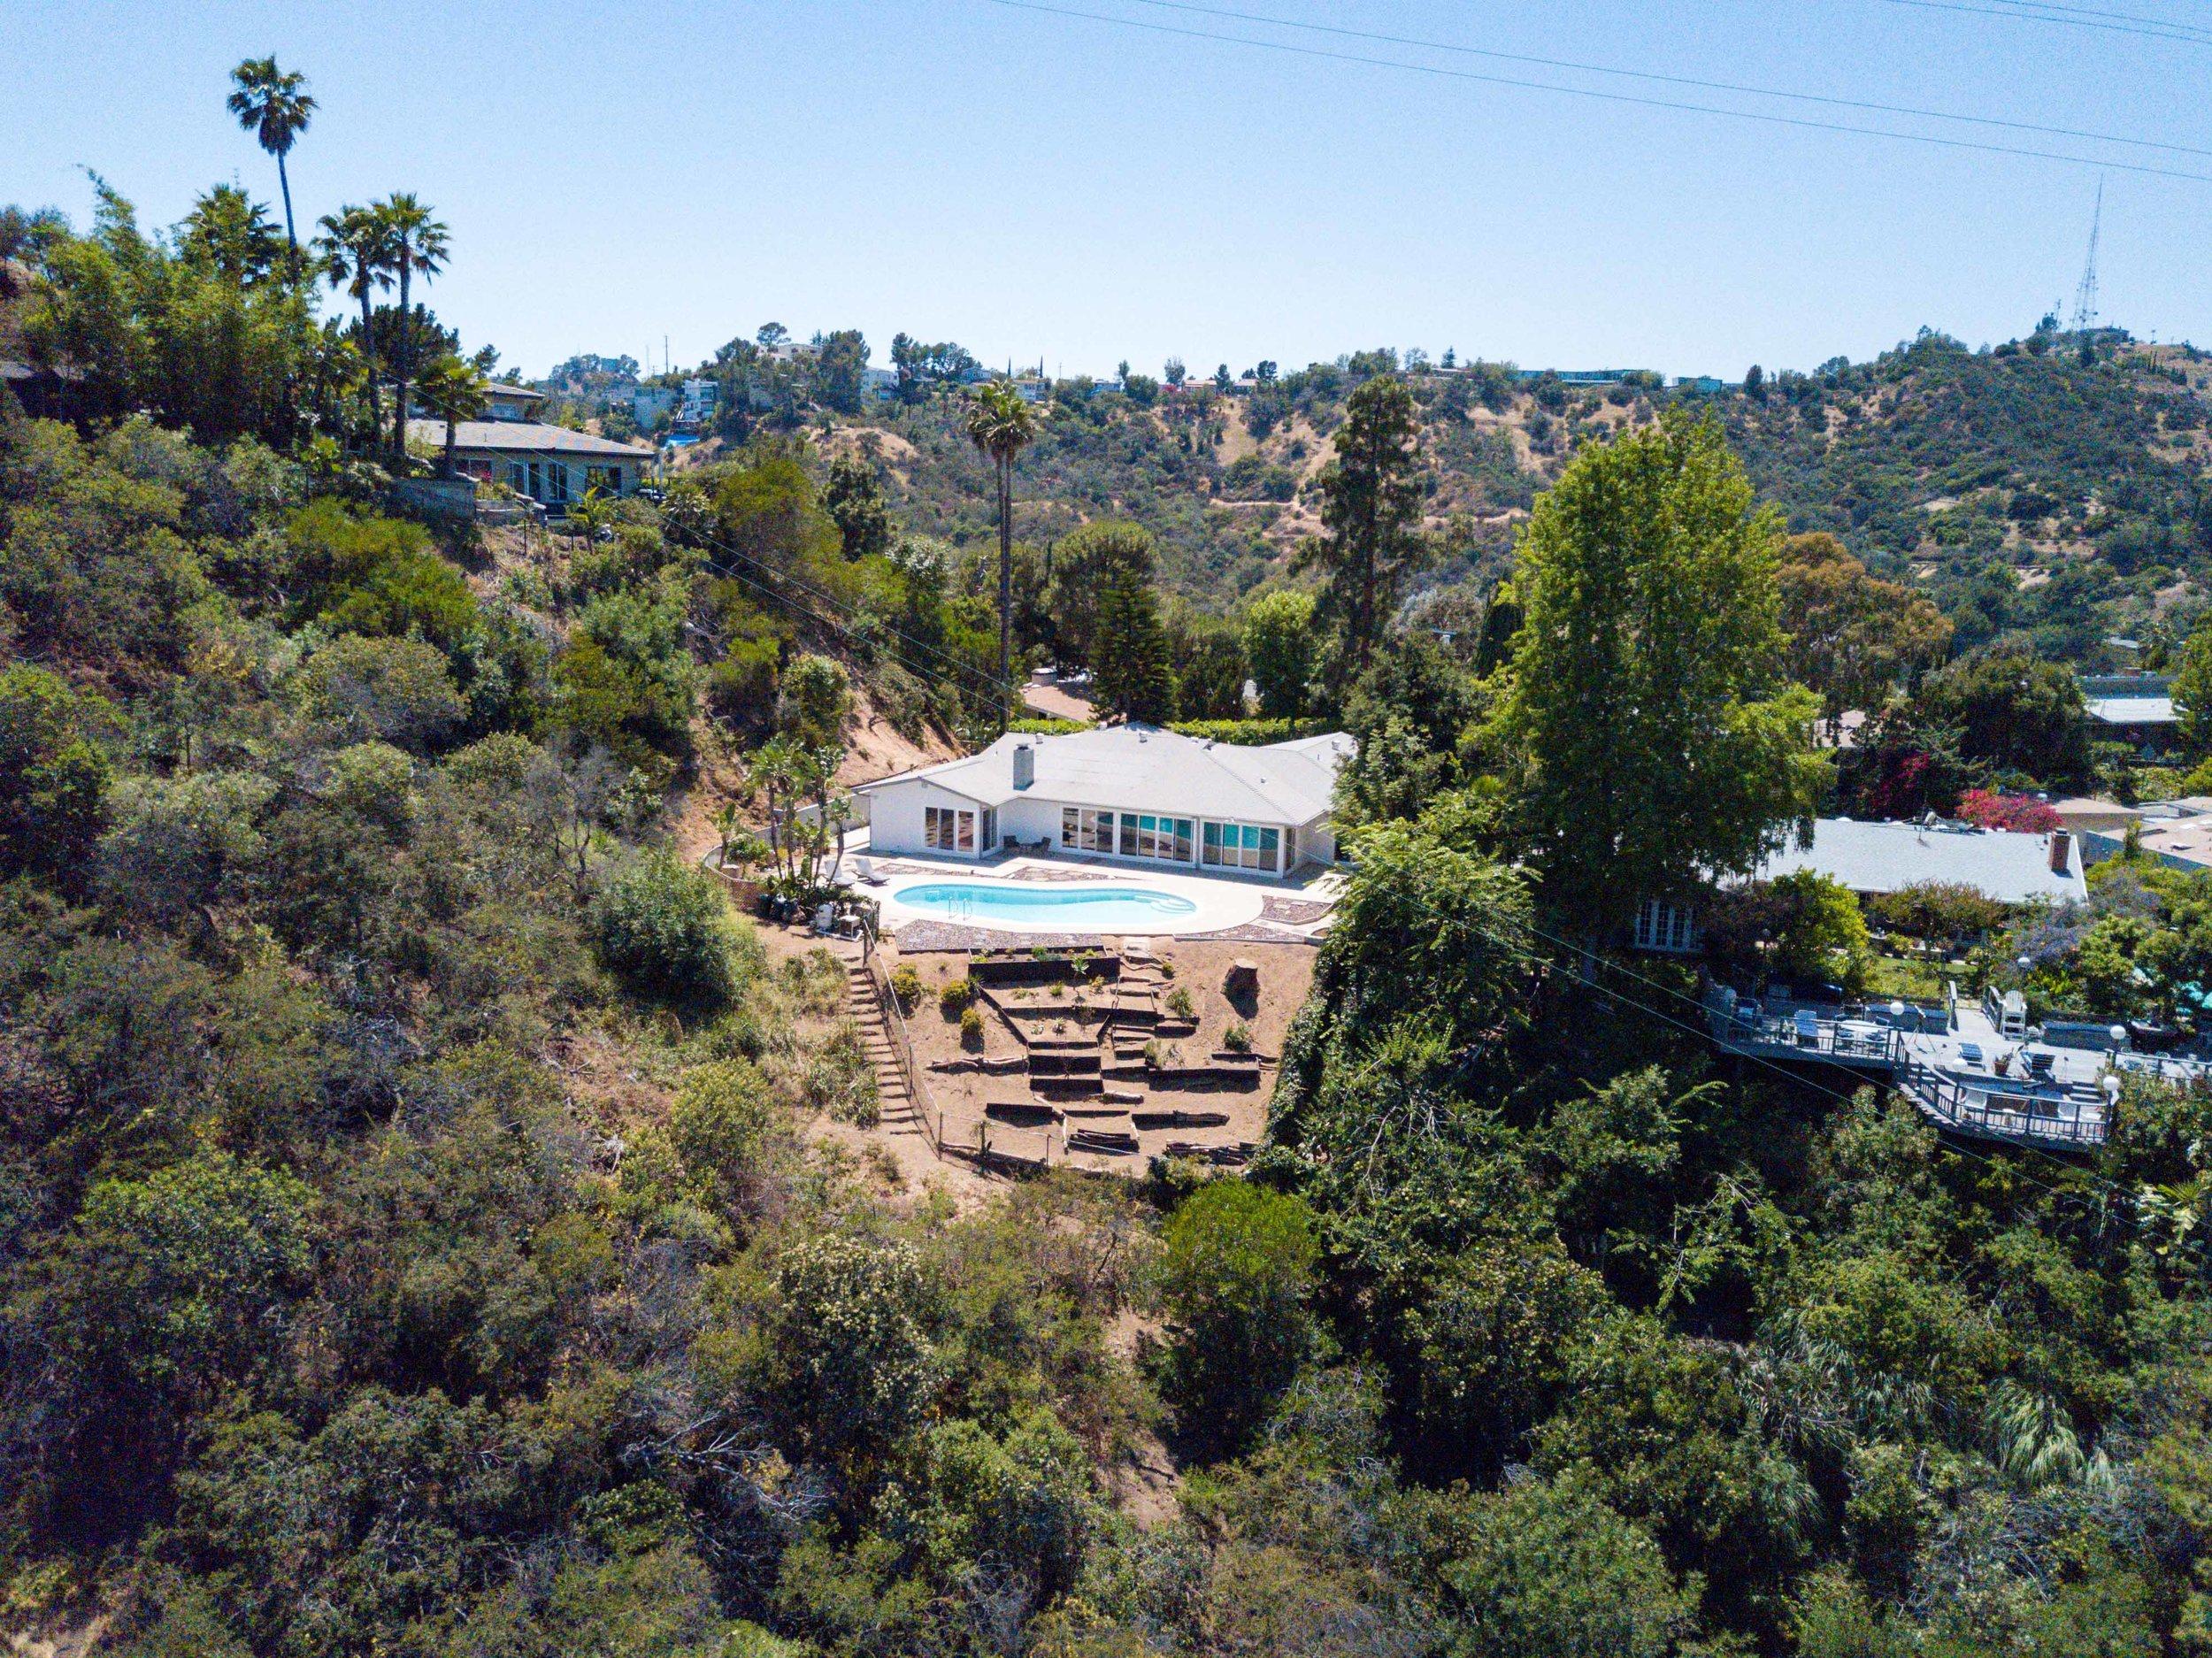 Hollywood - drone-0343.jpg